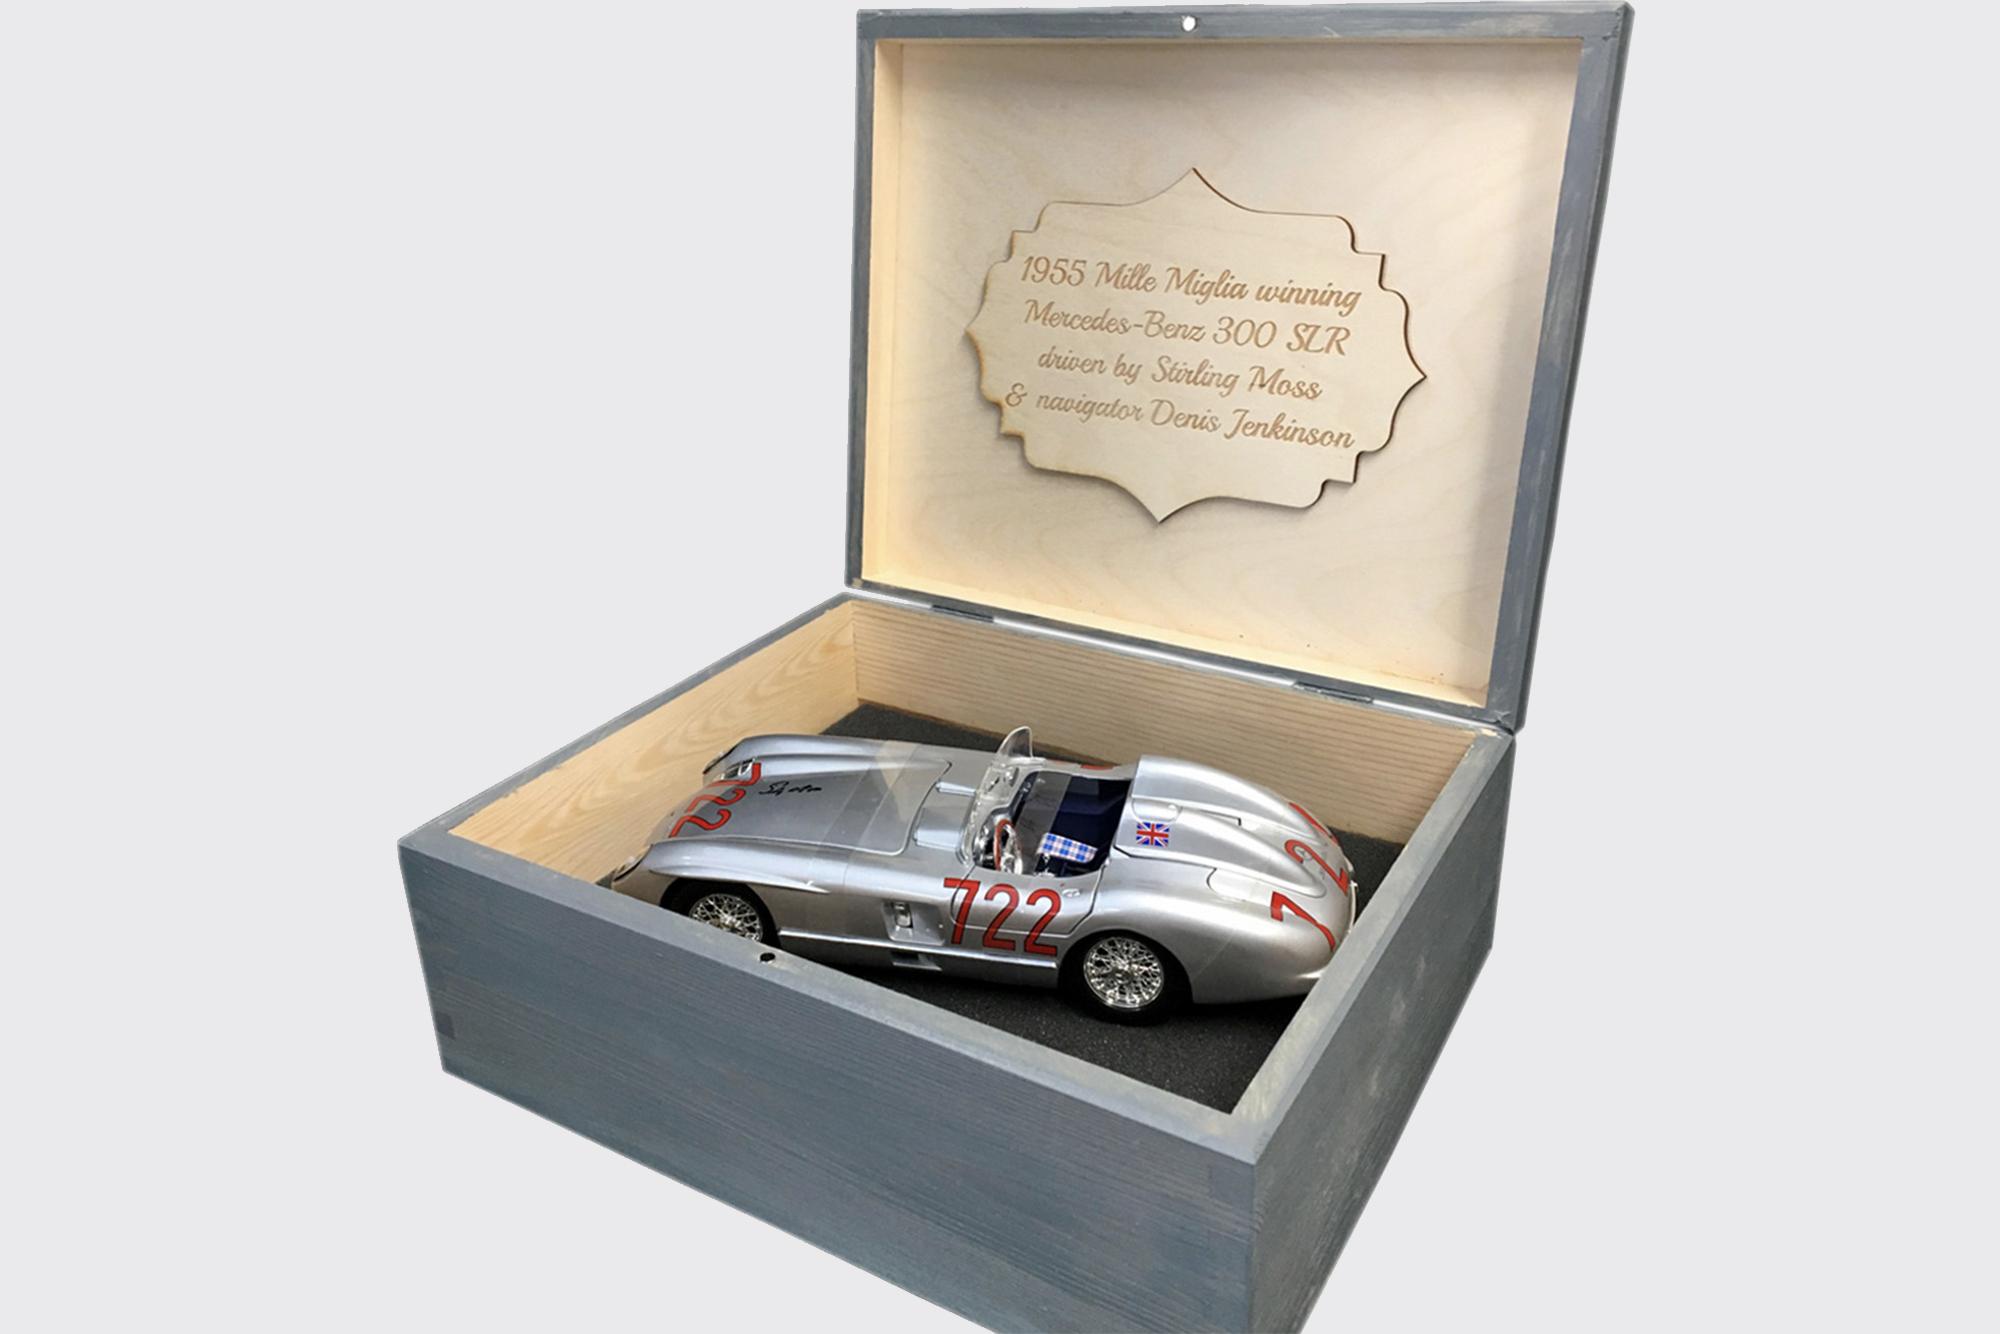 Stirling Moss 722 signed model